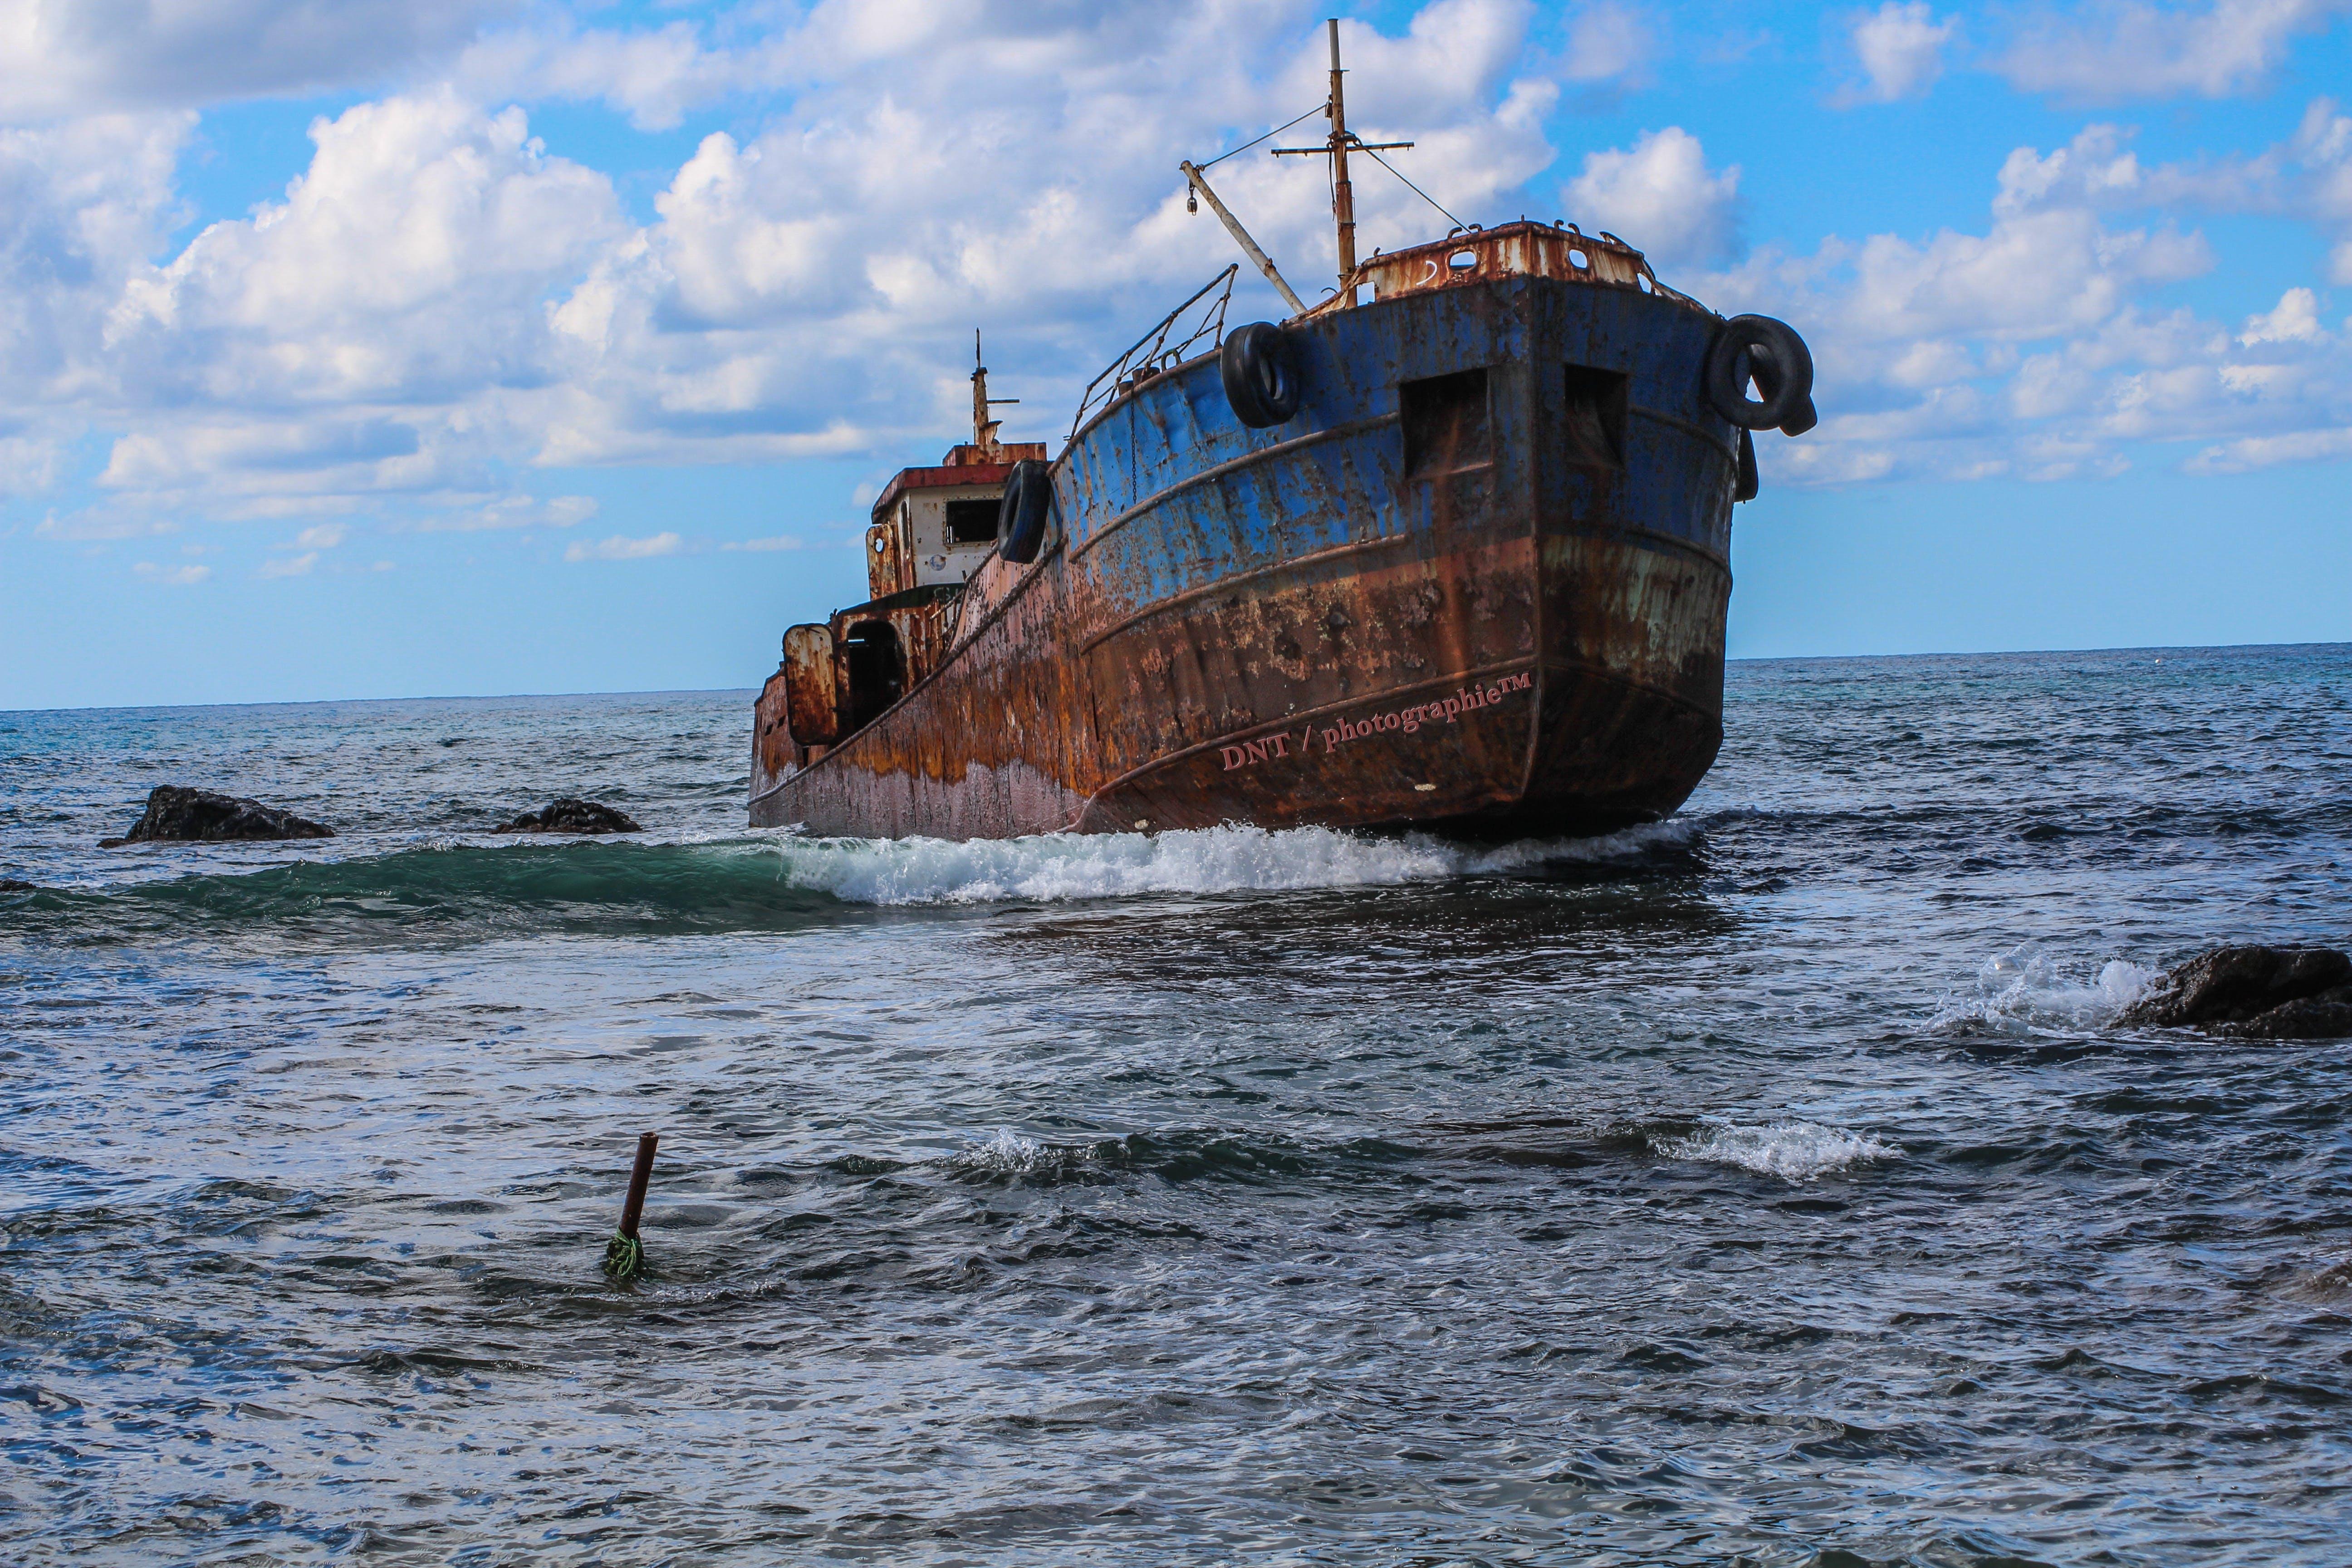 Vintage Brown Pirate Shipo